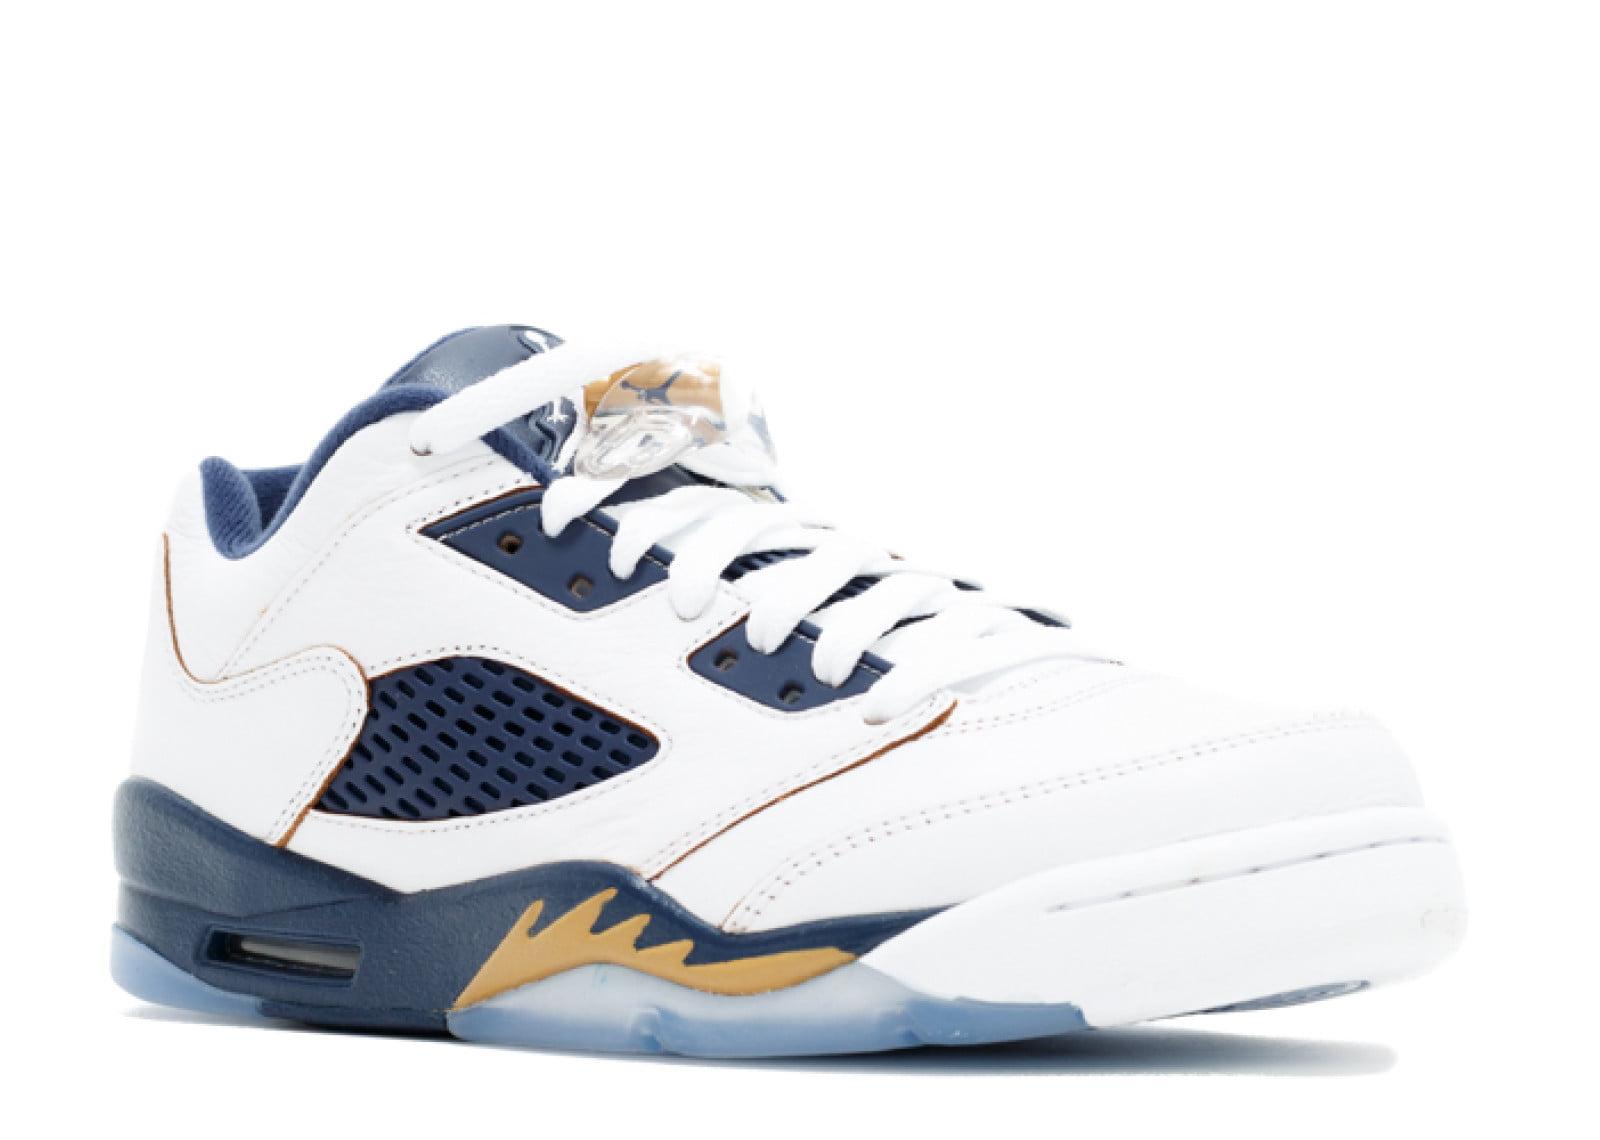 075d9ea4ba4d3c Nike Jordan Kids Air Jordan 5 Retro Low (GS) Basketball Shoe